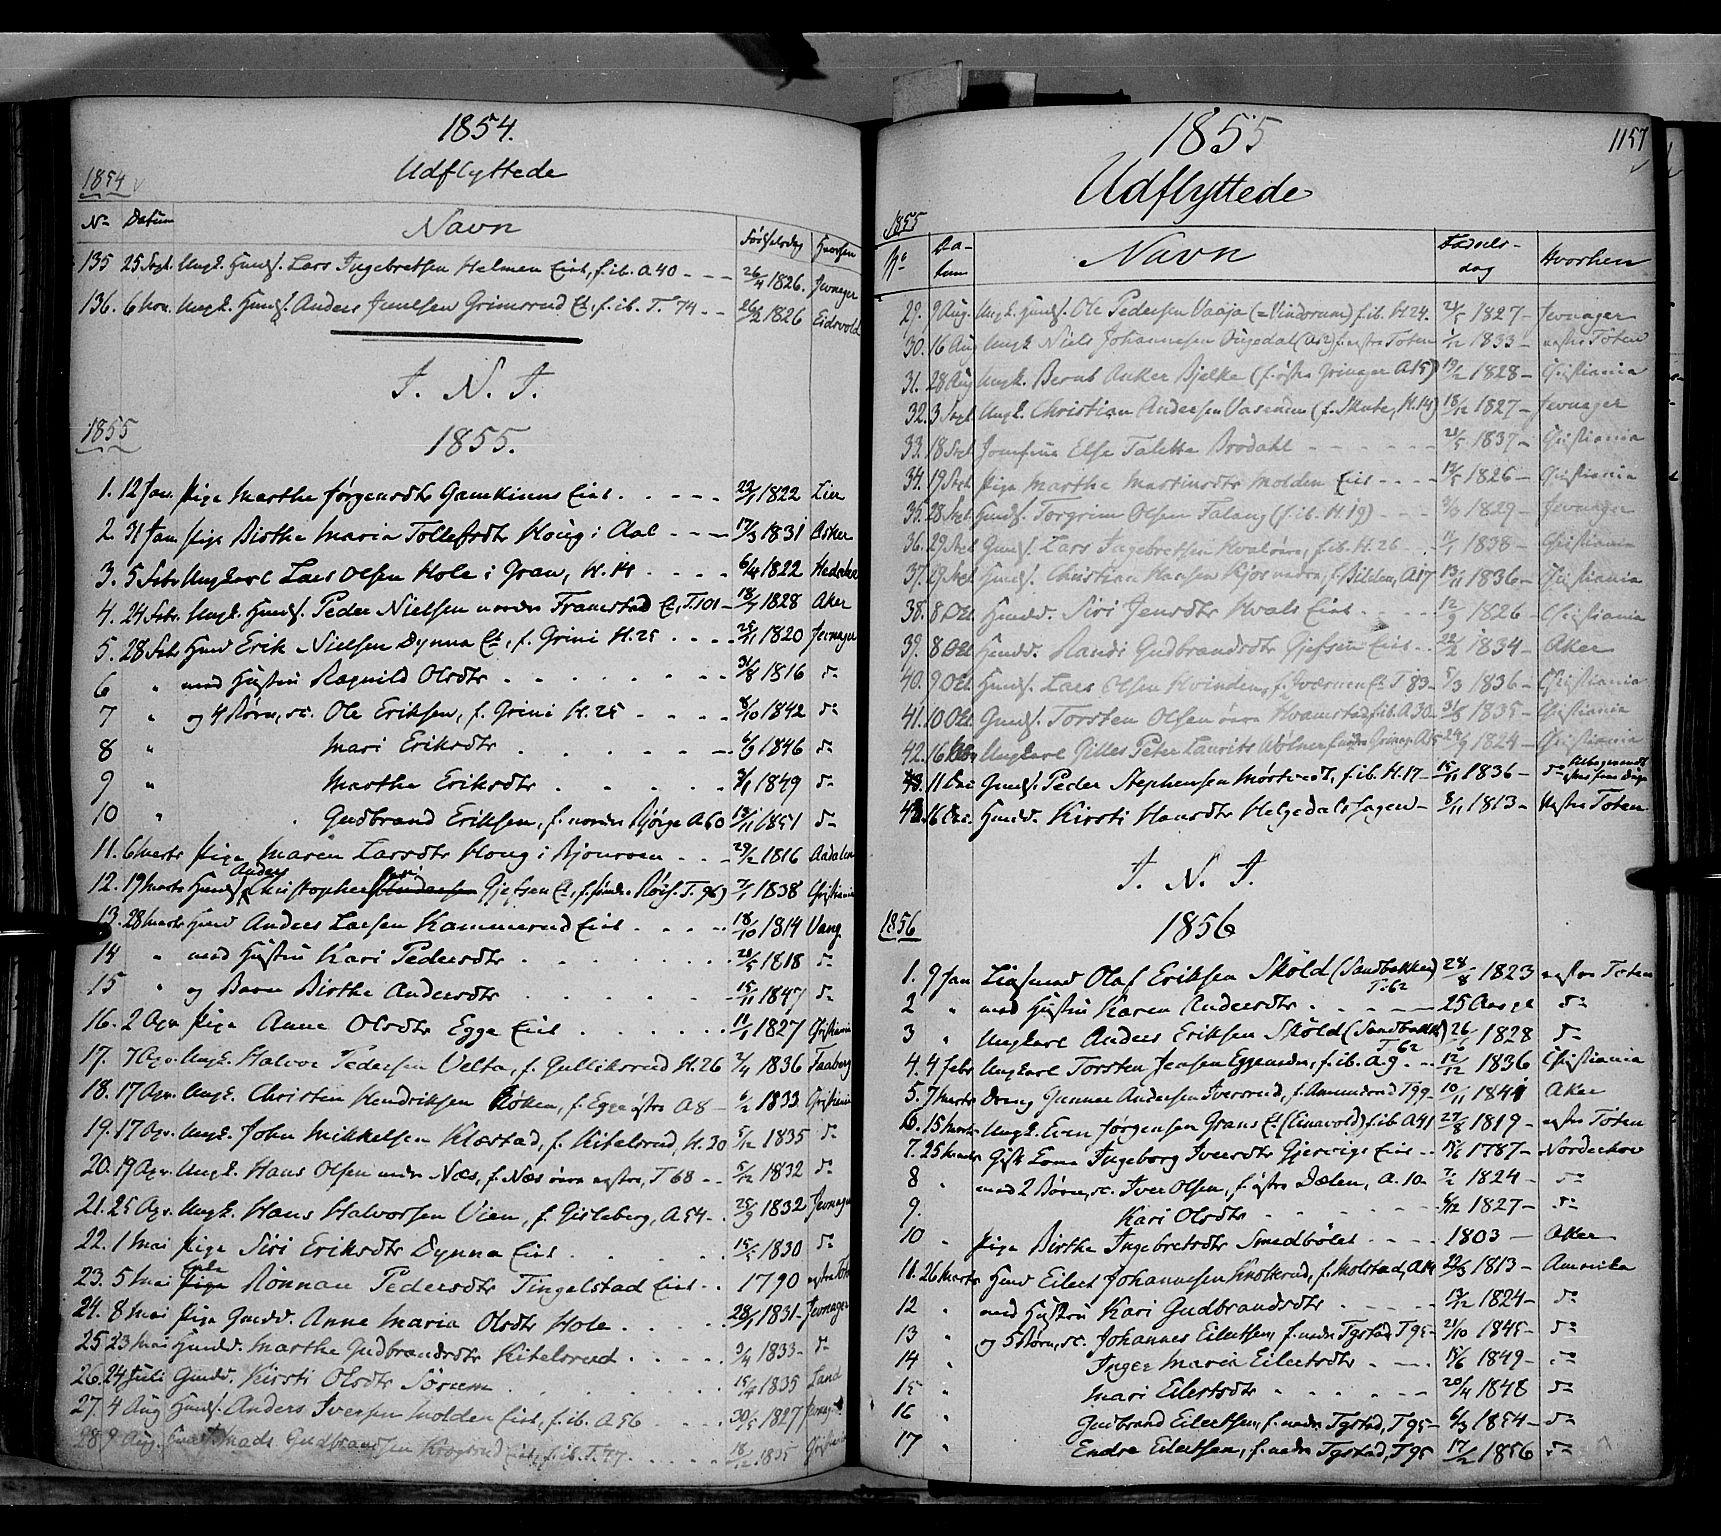 SAH, Gran prestekontor, Ministerialbok nr. 11, 1842-1856, s. 1156-1157